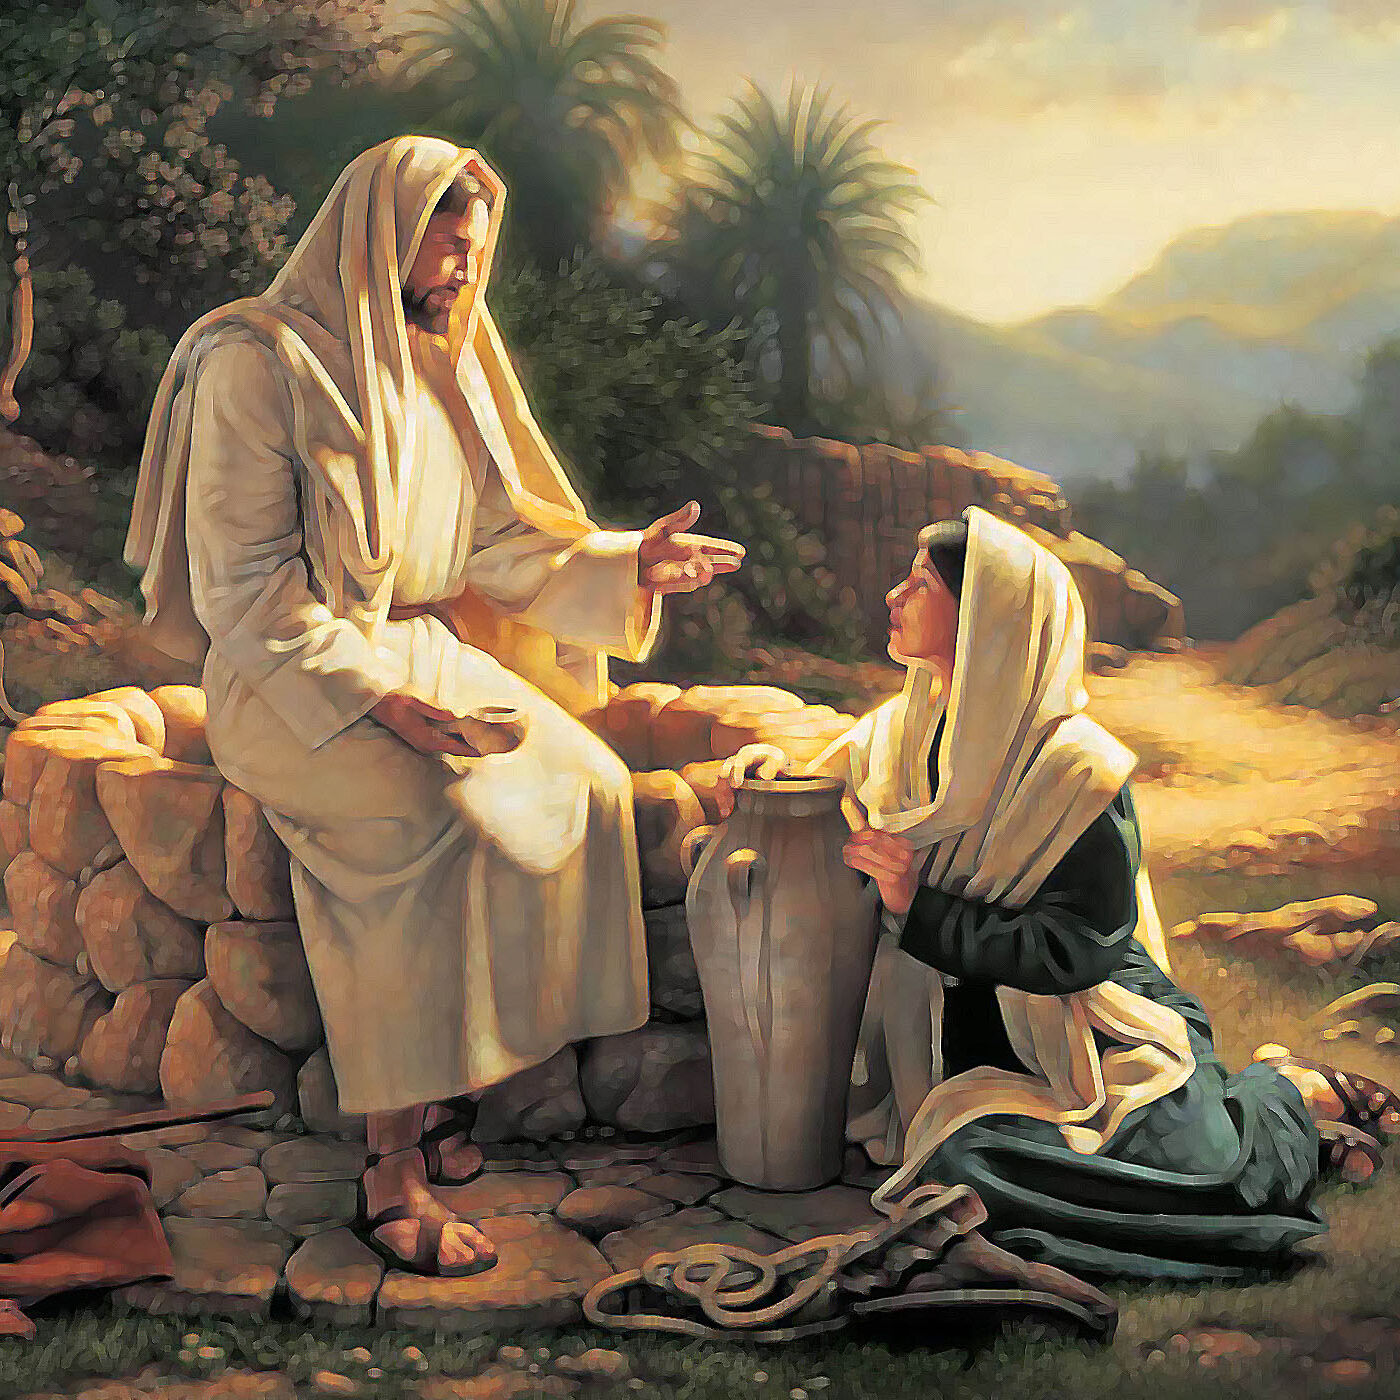 riflessioni sul Vangelo di Mercoledì 14 Ottobre 2020 (Lc 11, 42-46)